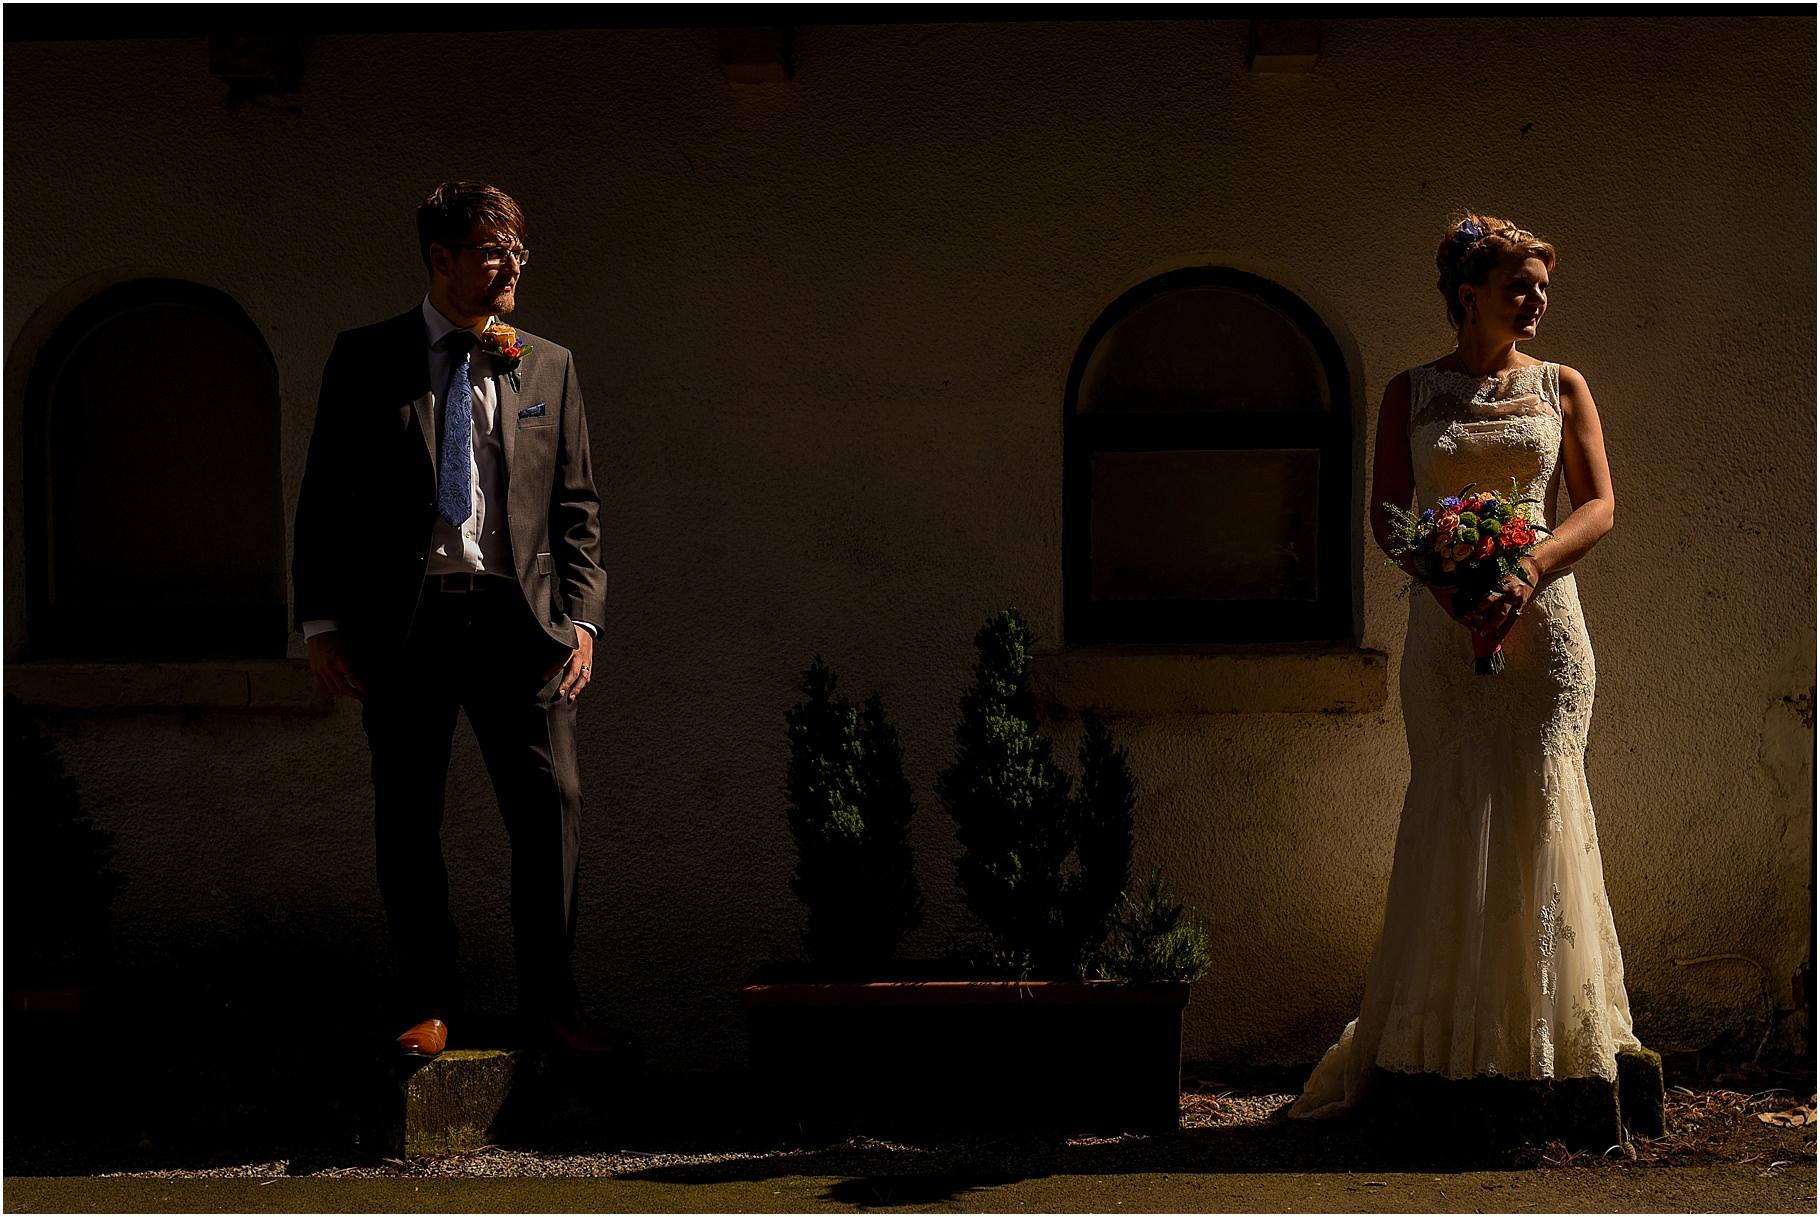 dan-wootton-photography-2017-weddings-098.jpg